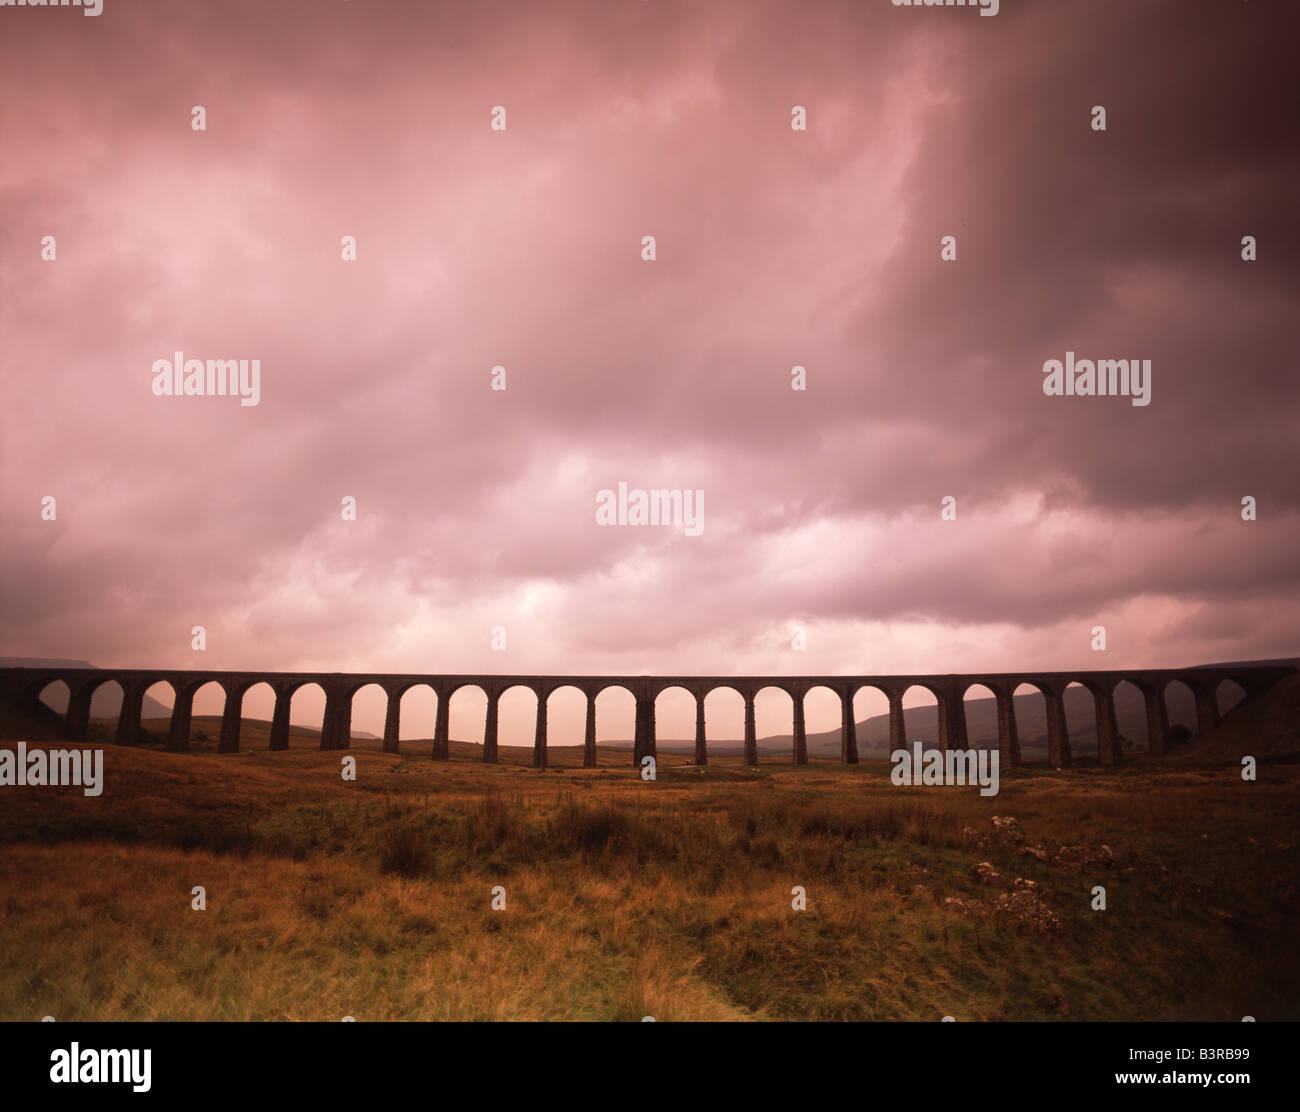 Ribblehead Viaduct, railway viaduct, North Yorkshire, northern England - Stock Image